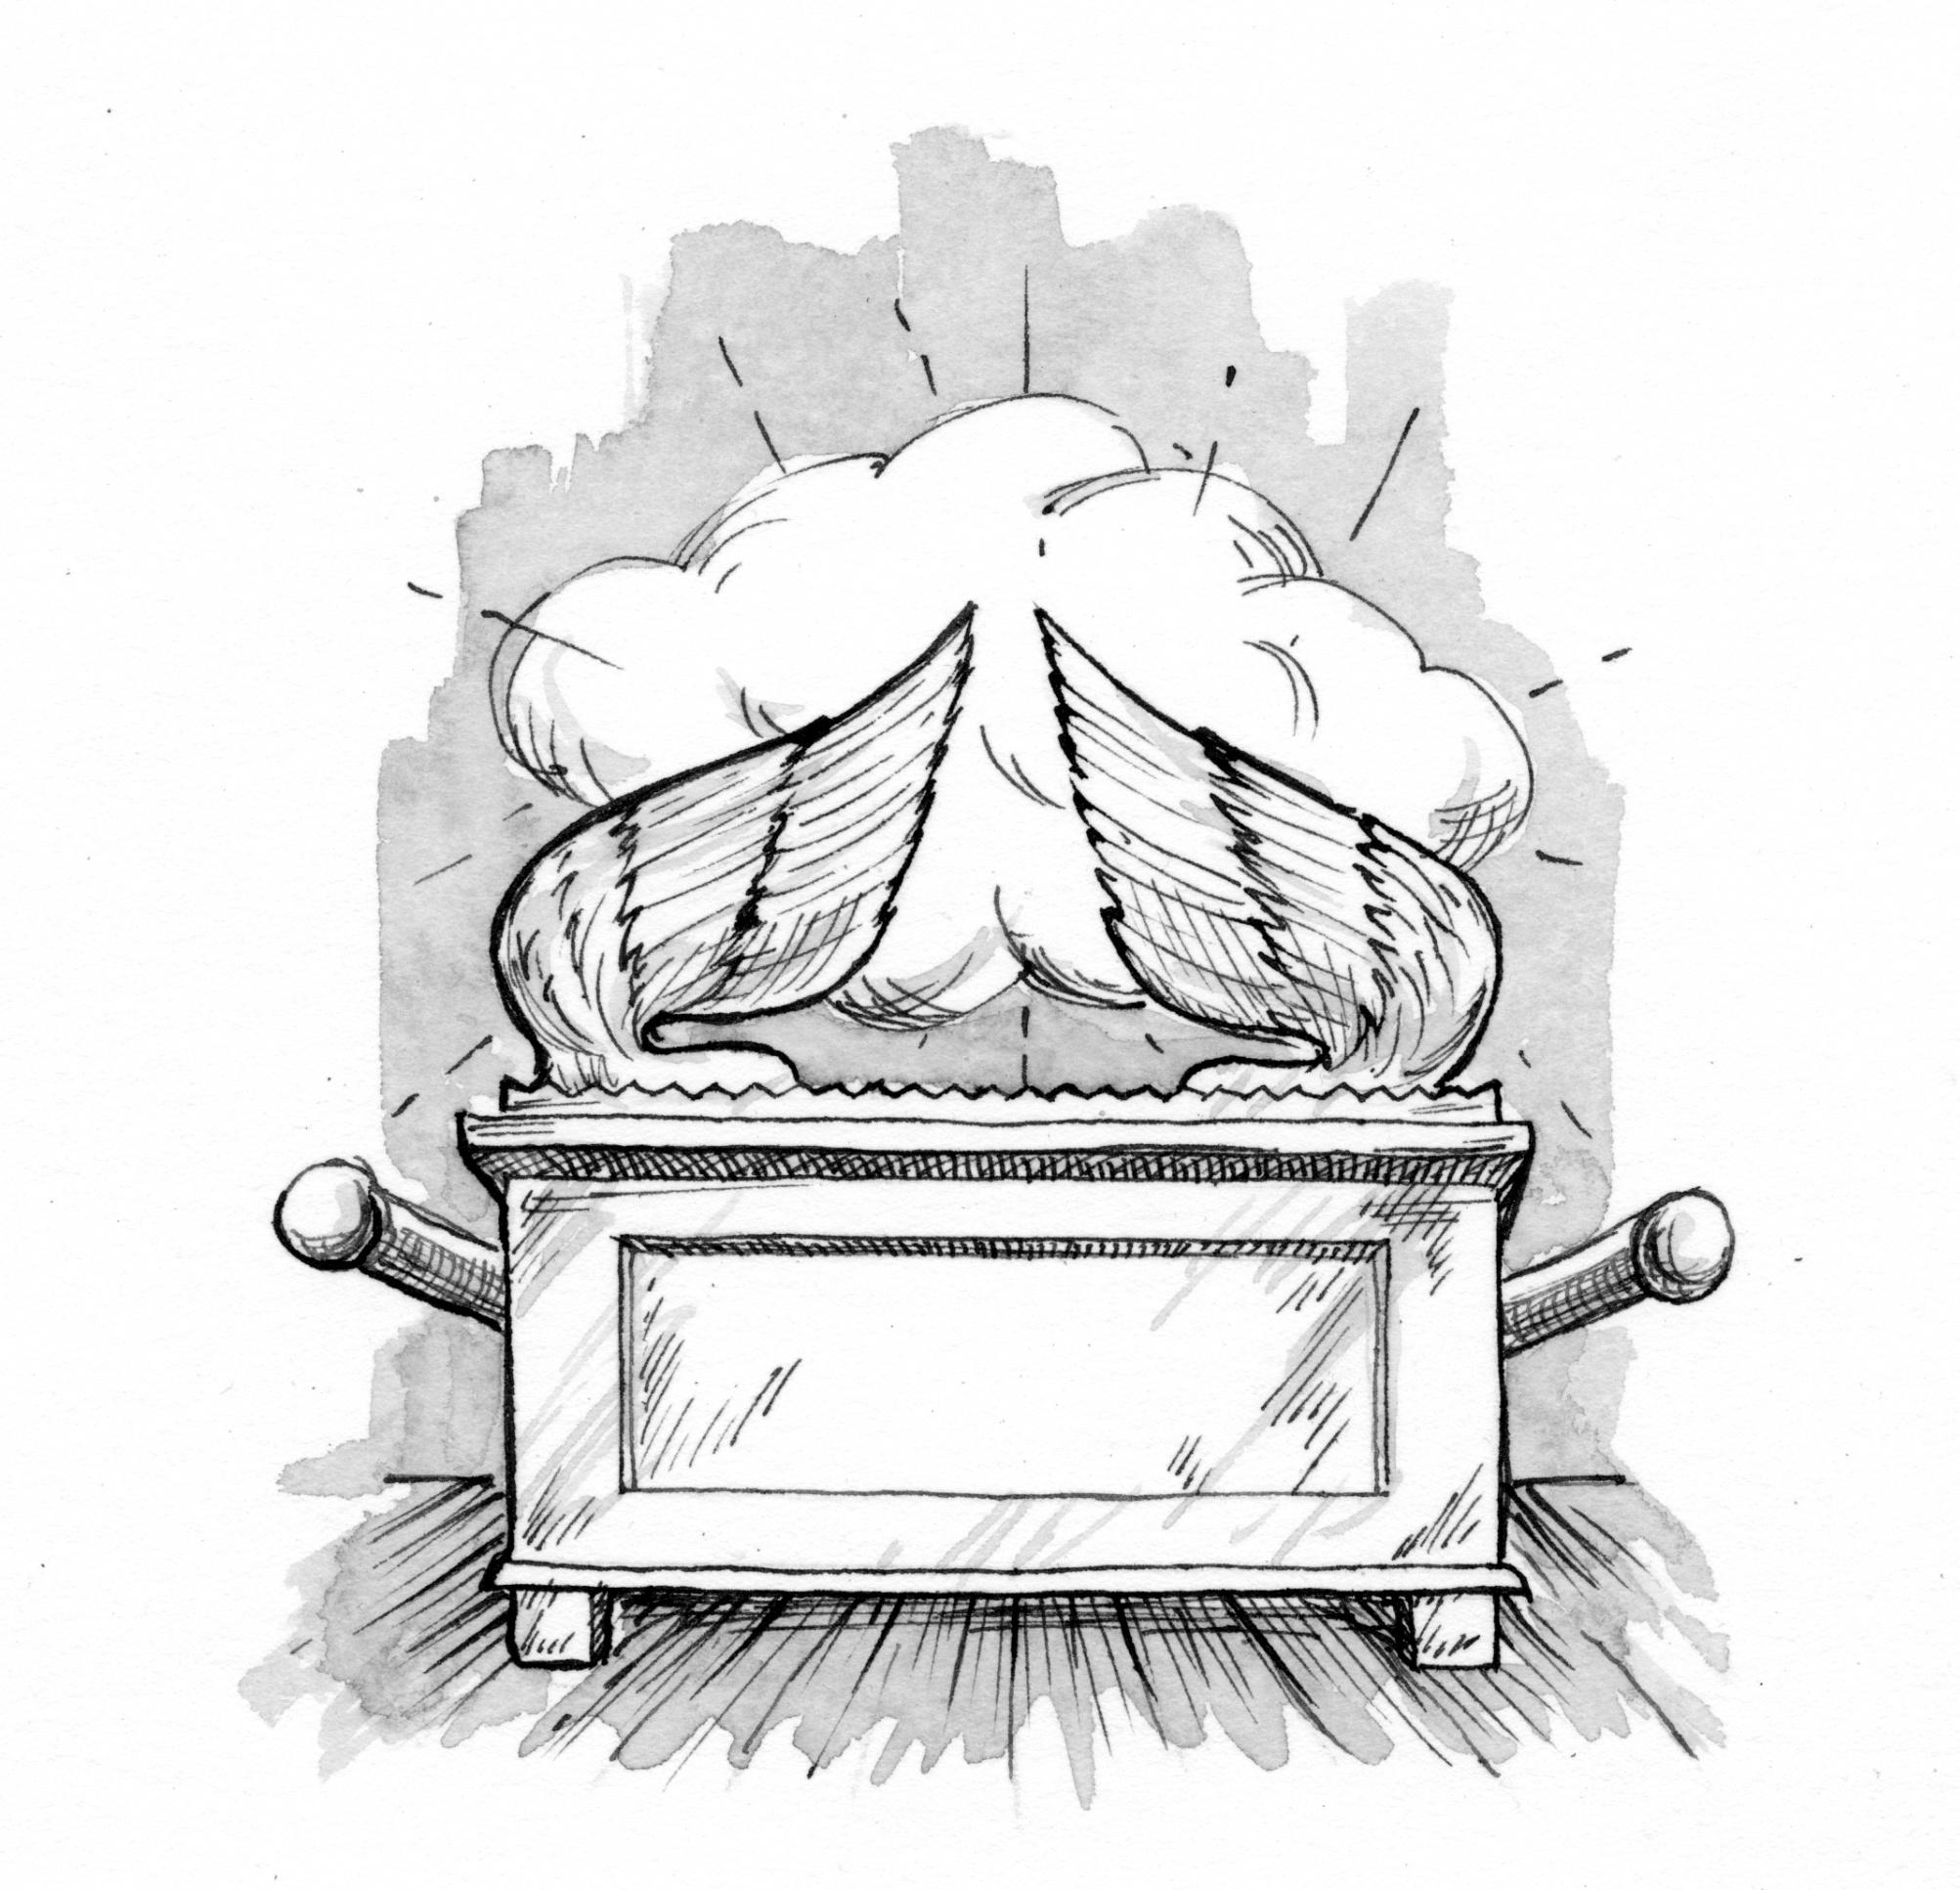 Exodus 371 9 Illustration The Ark Of The Covenant